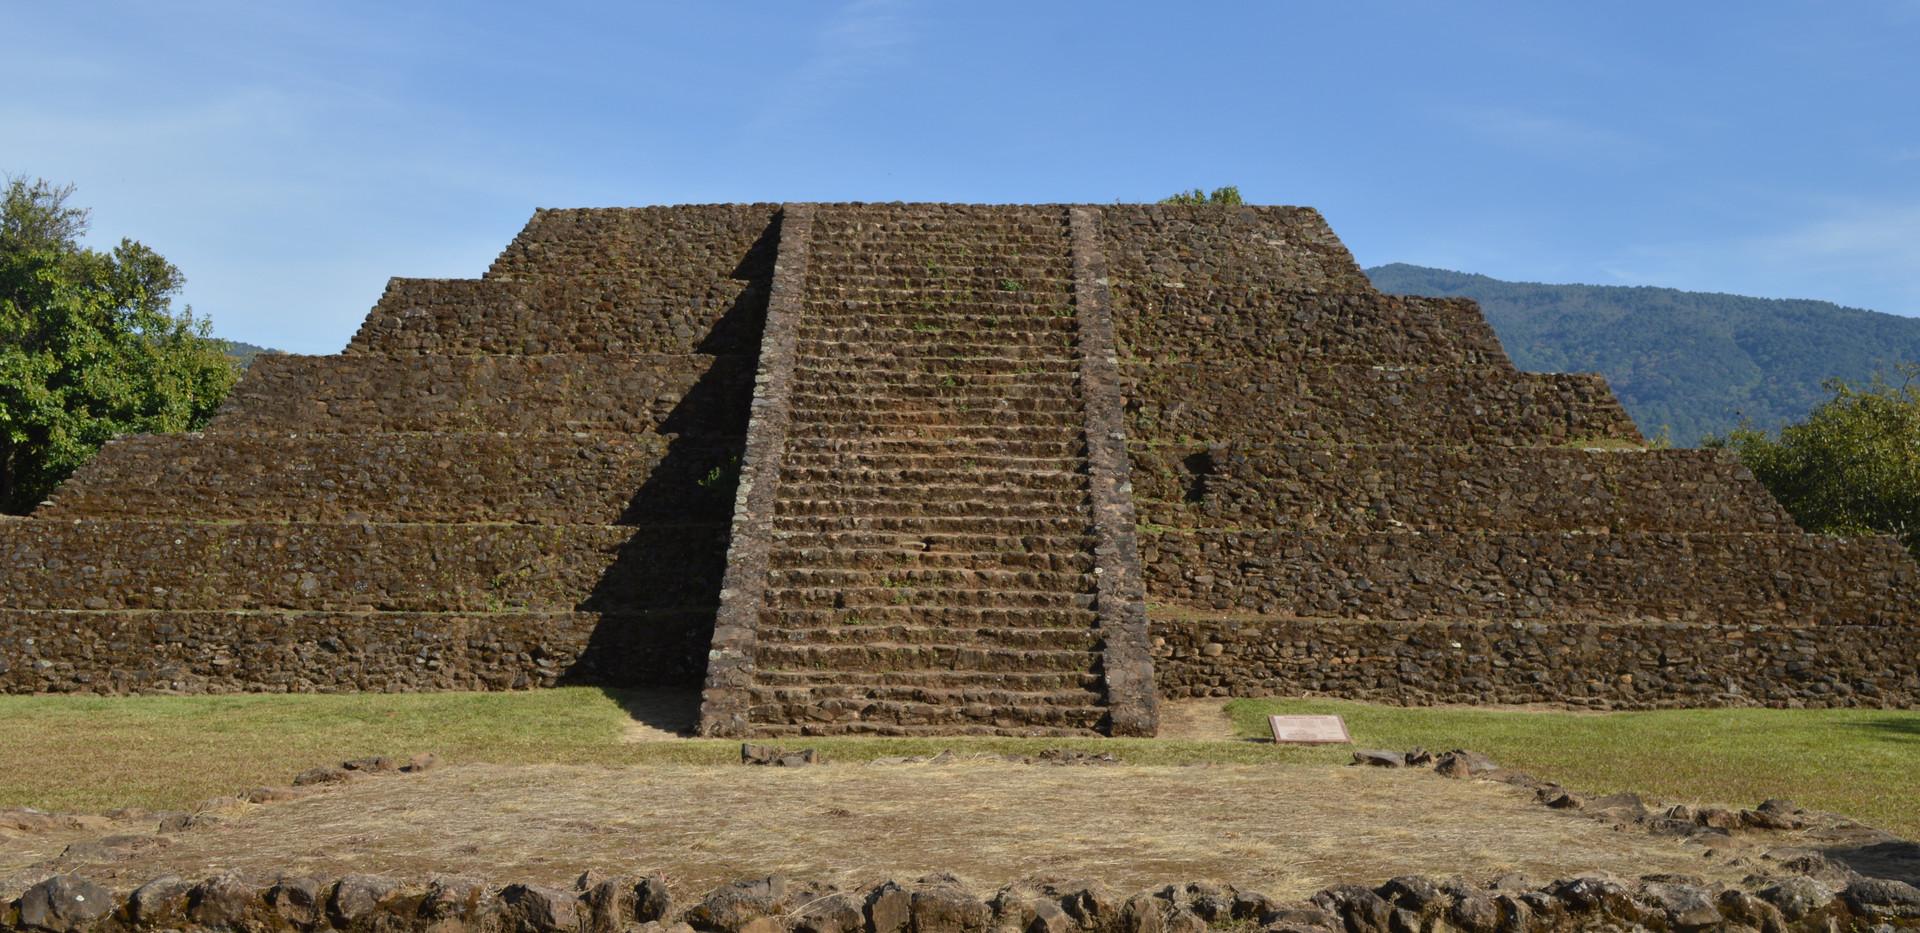 Ancient City of Tingambato - Archaeology